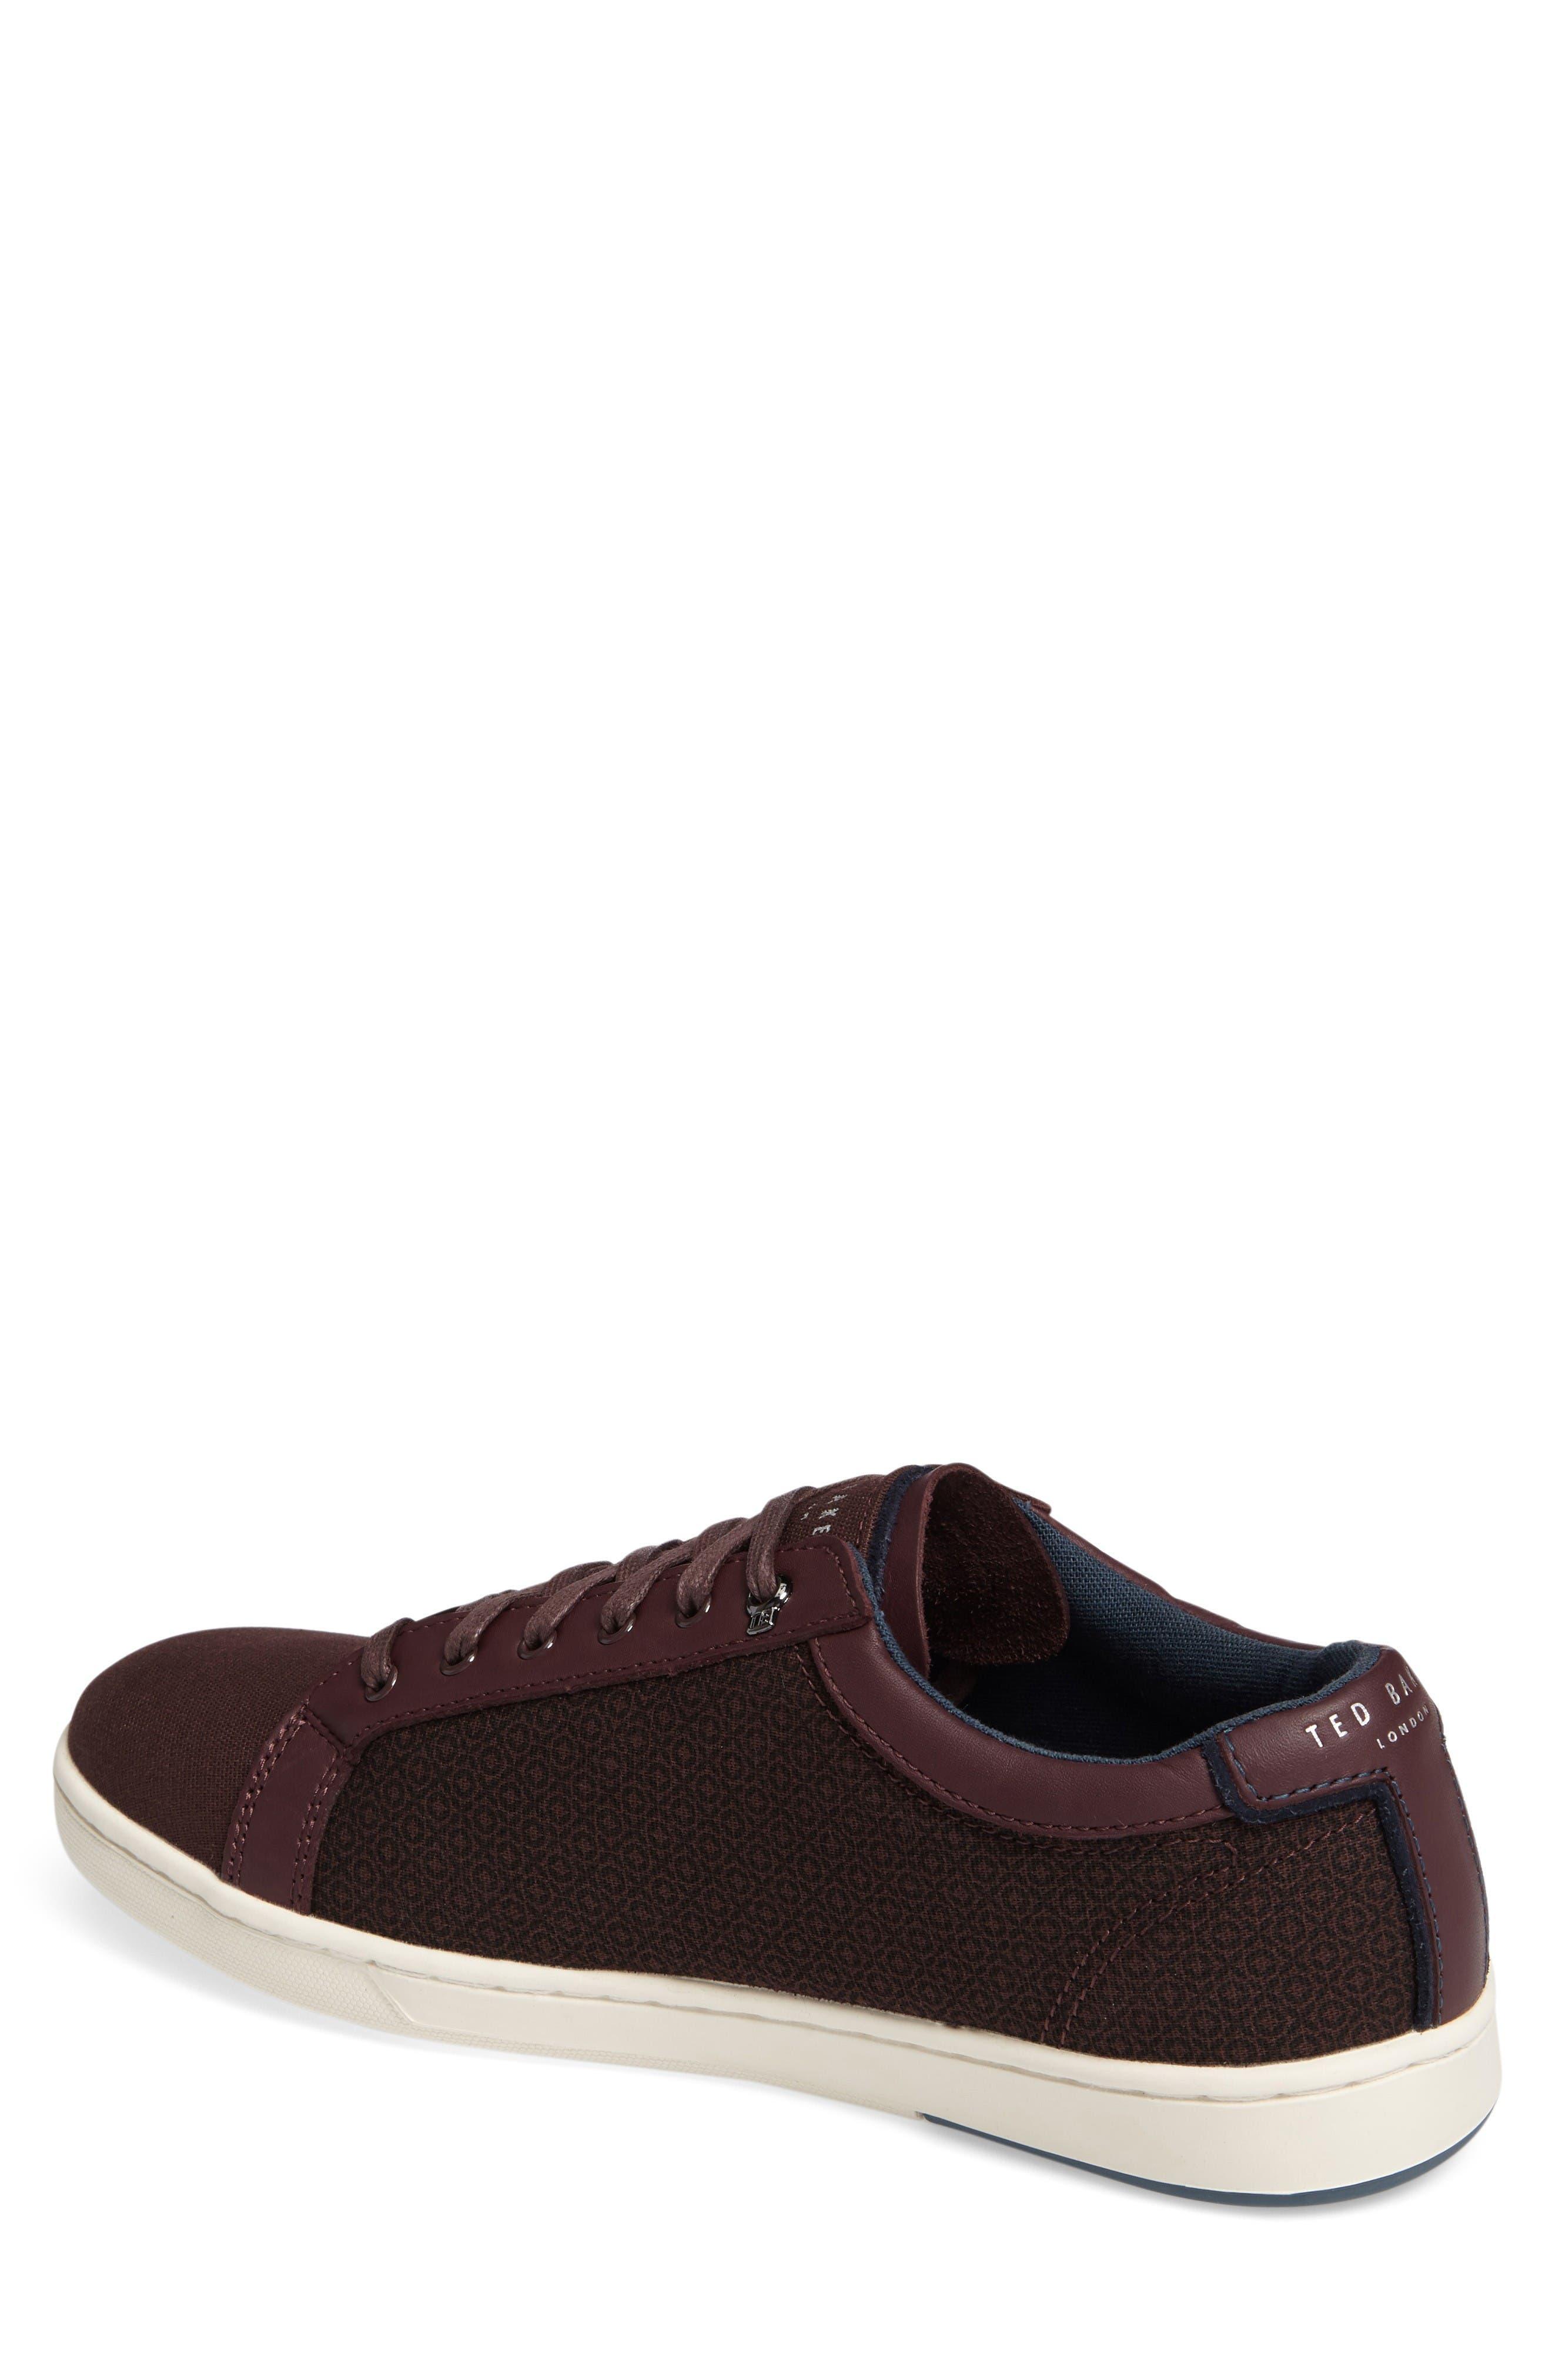 Ternur Geo Print Sneaker,                             Alternate thumbnail 2, color,                             Dark Red